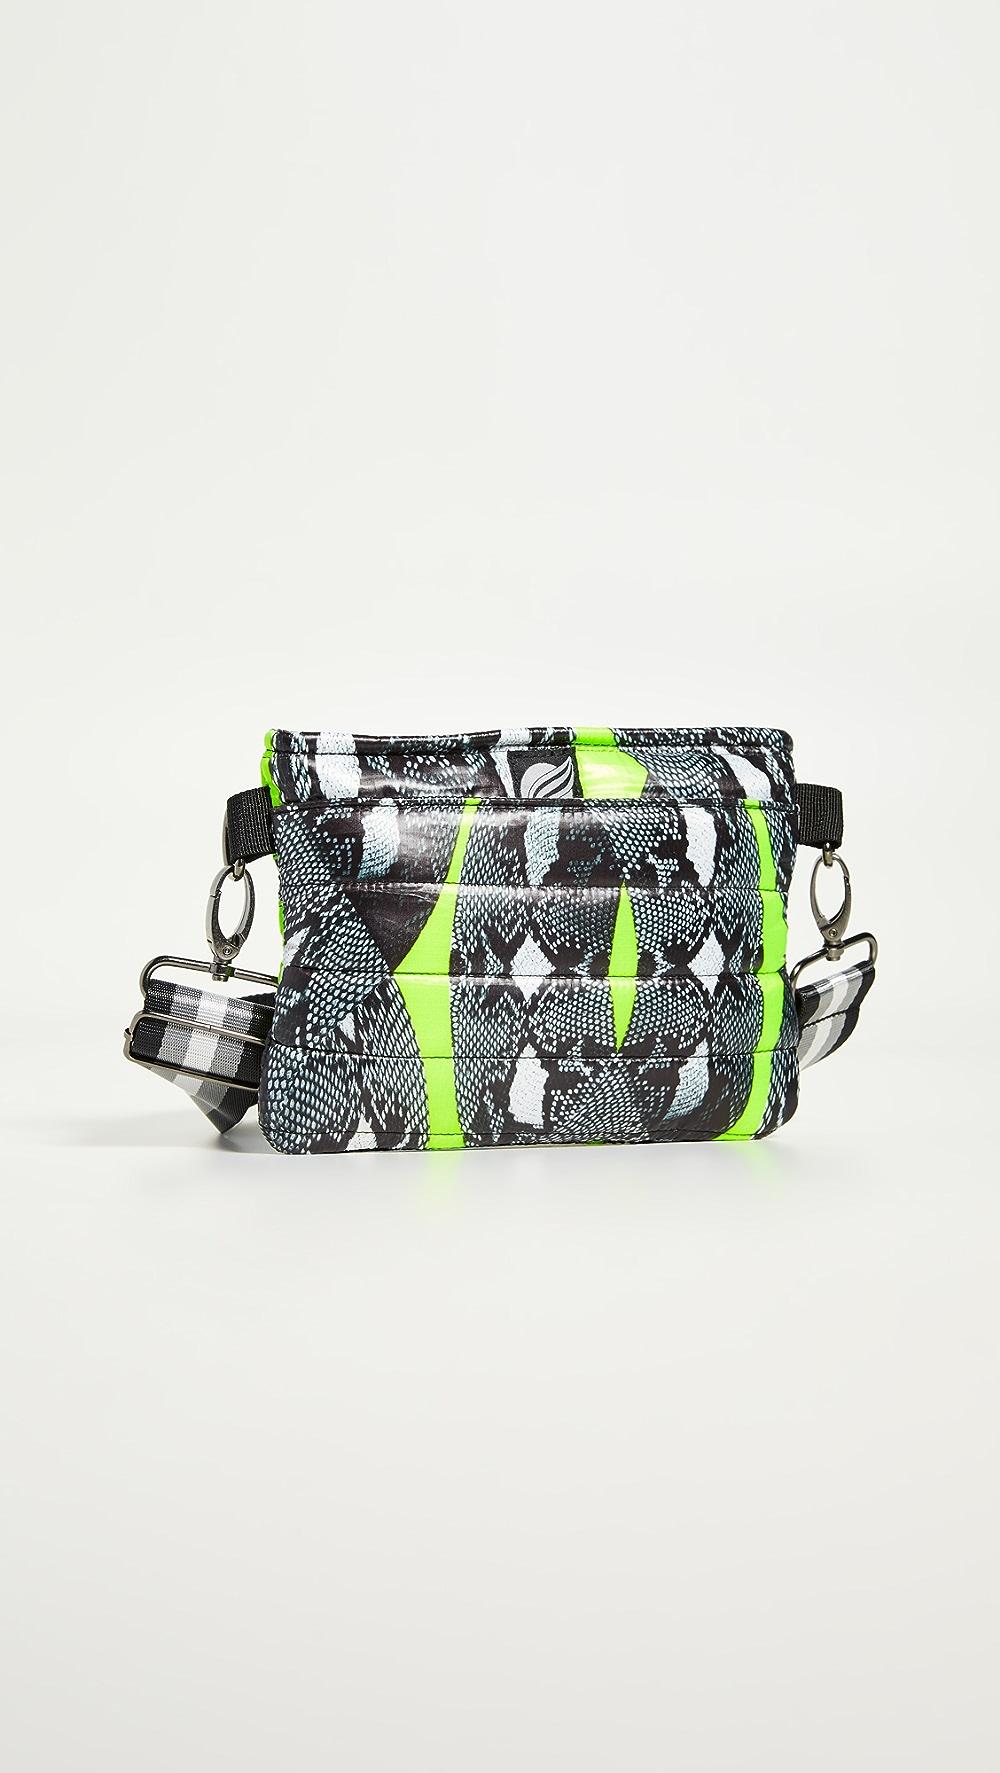 Discreet Think Royln - Convertible Belt Crossbody Bag Cheap Sales 50%